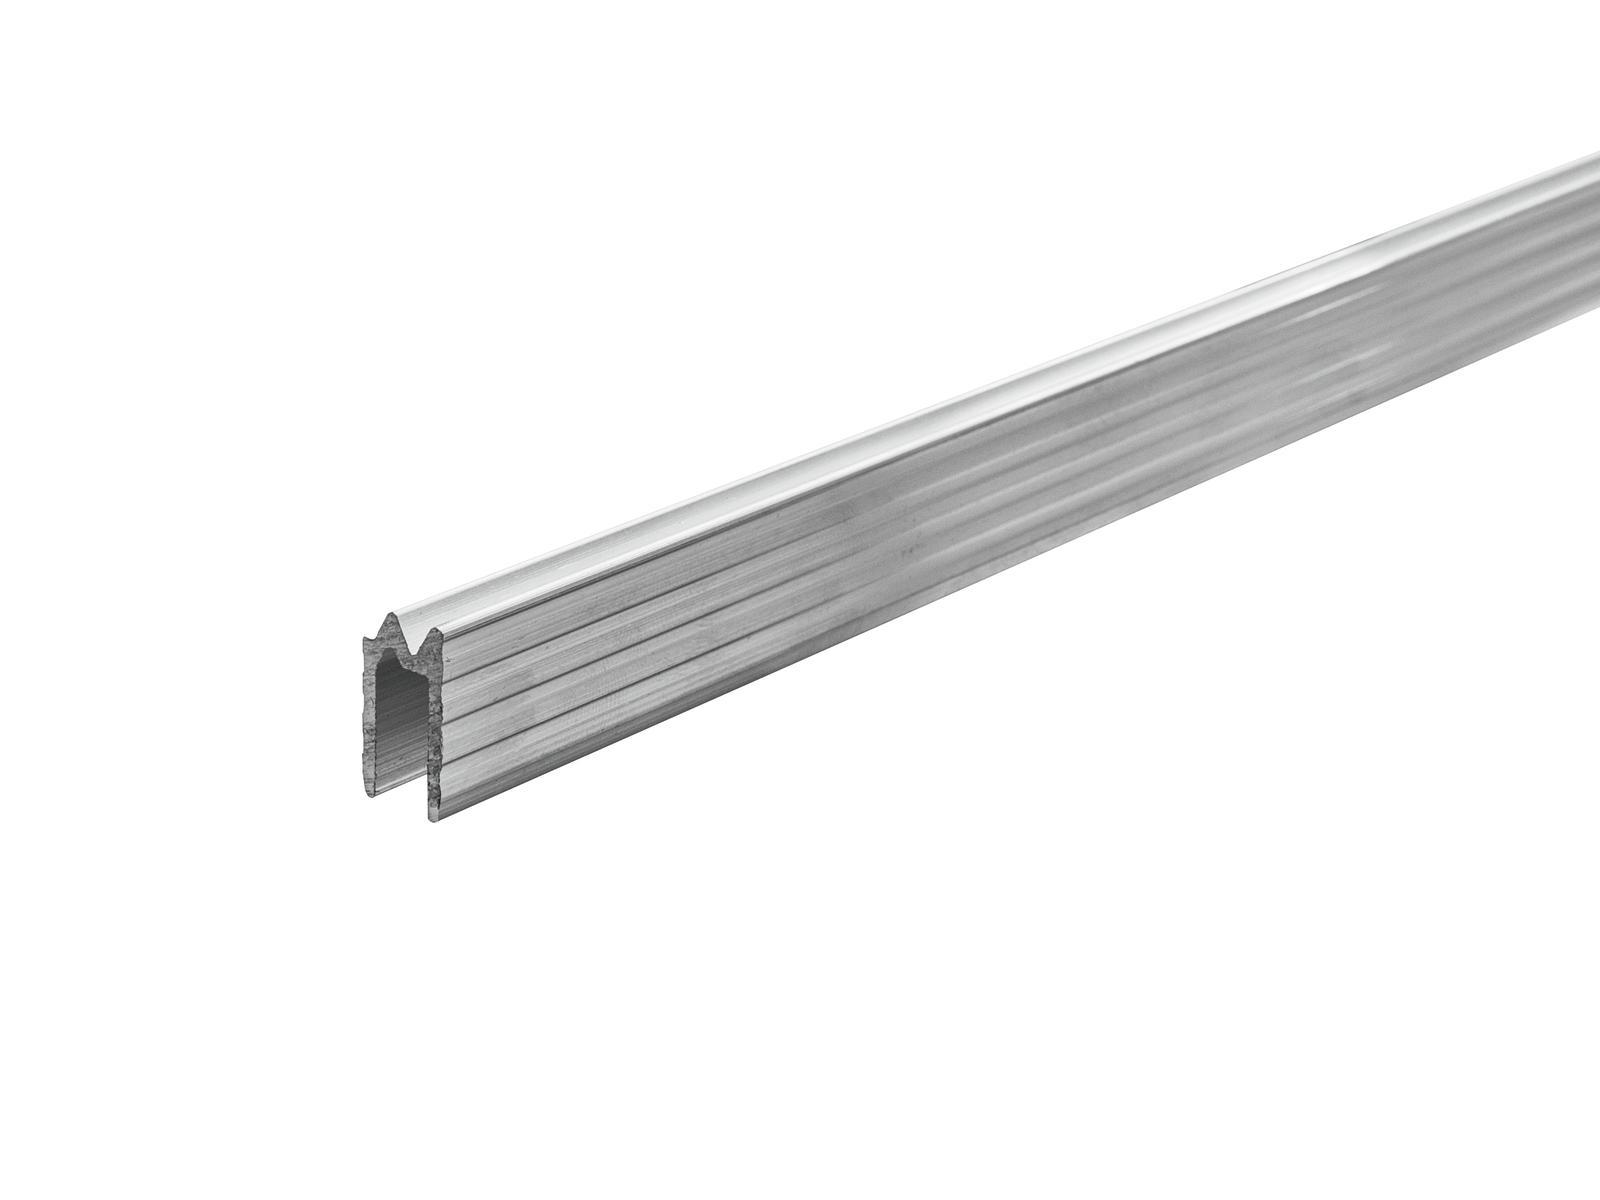 Accessory hliníková lišta 6,8mm, cena za metr